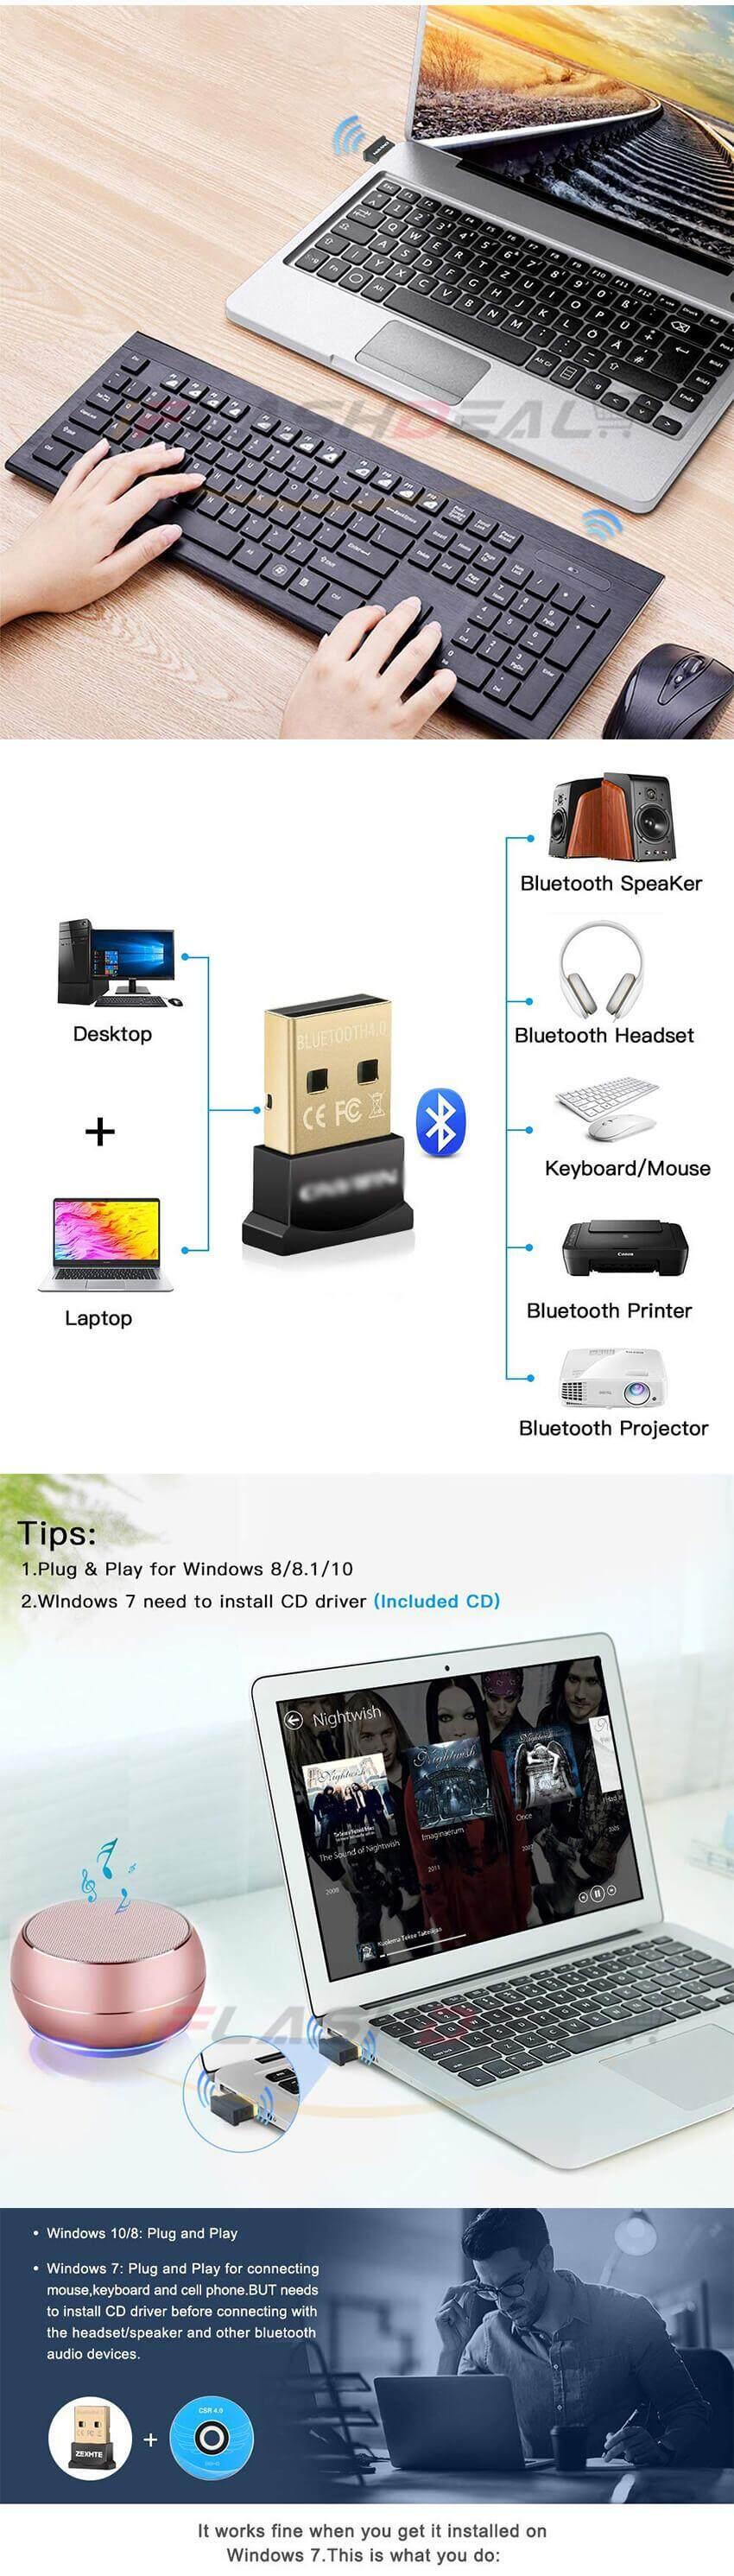 iFlashDeal USB Bluetooth Adapter for PC Wireless Dongle Mini Bluetooth USB  Dongle Dual Mode Bluetooth 4 0 Adapter for PC Computer Laptop Windows